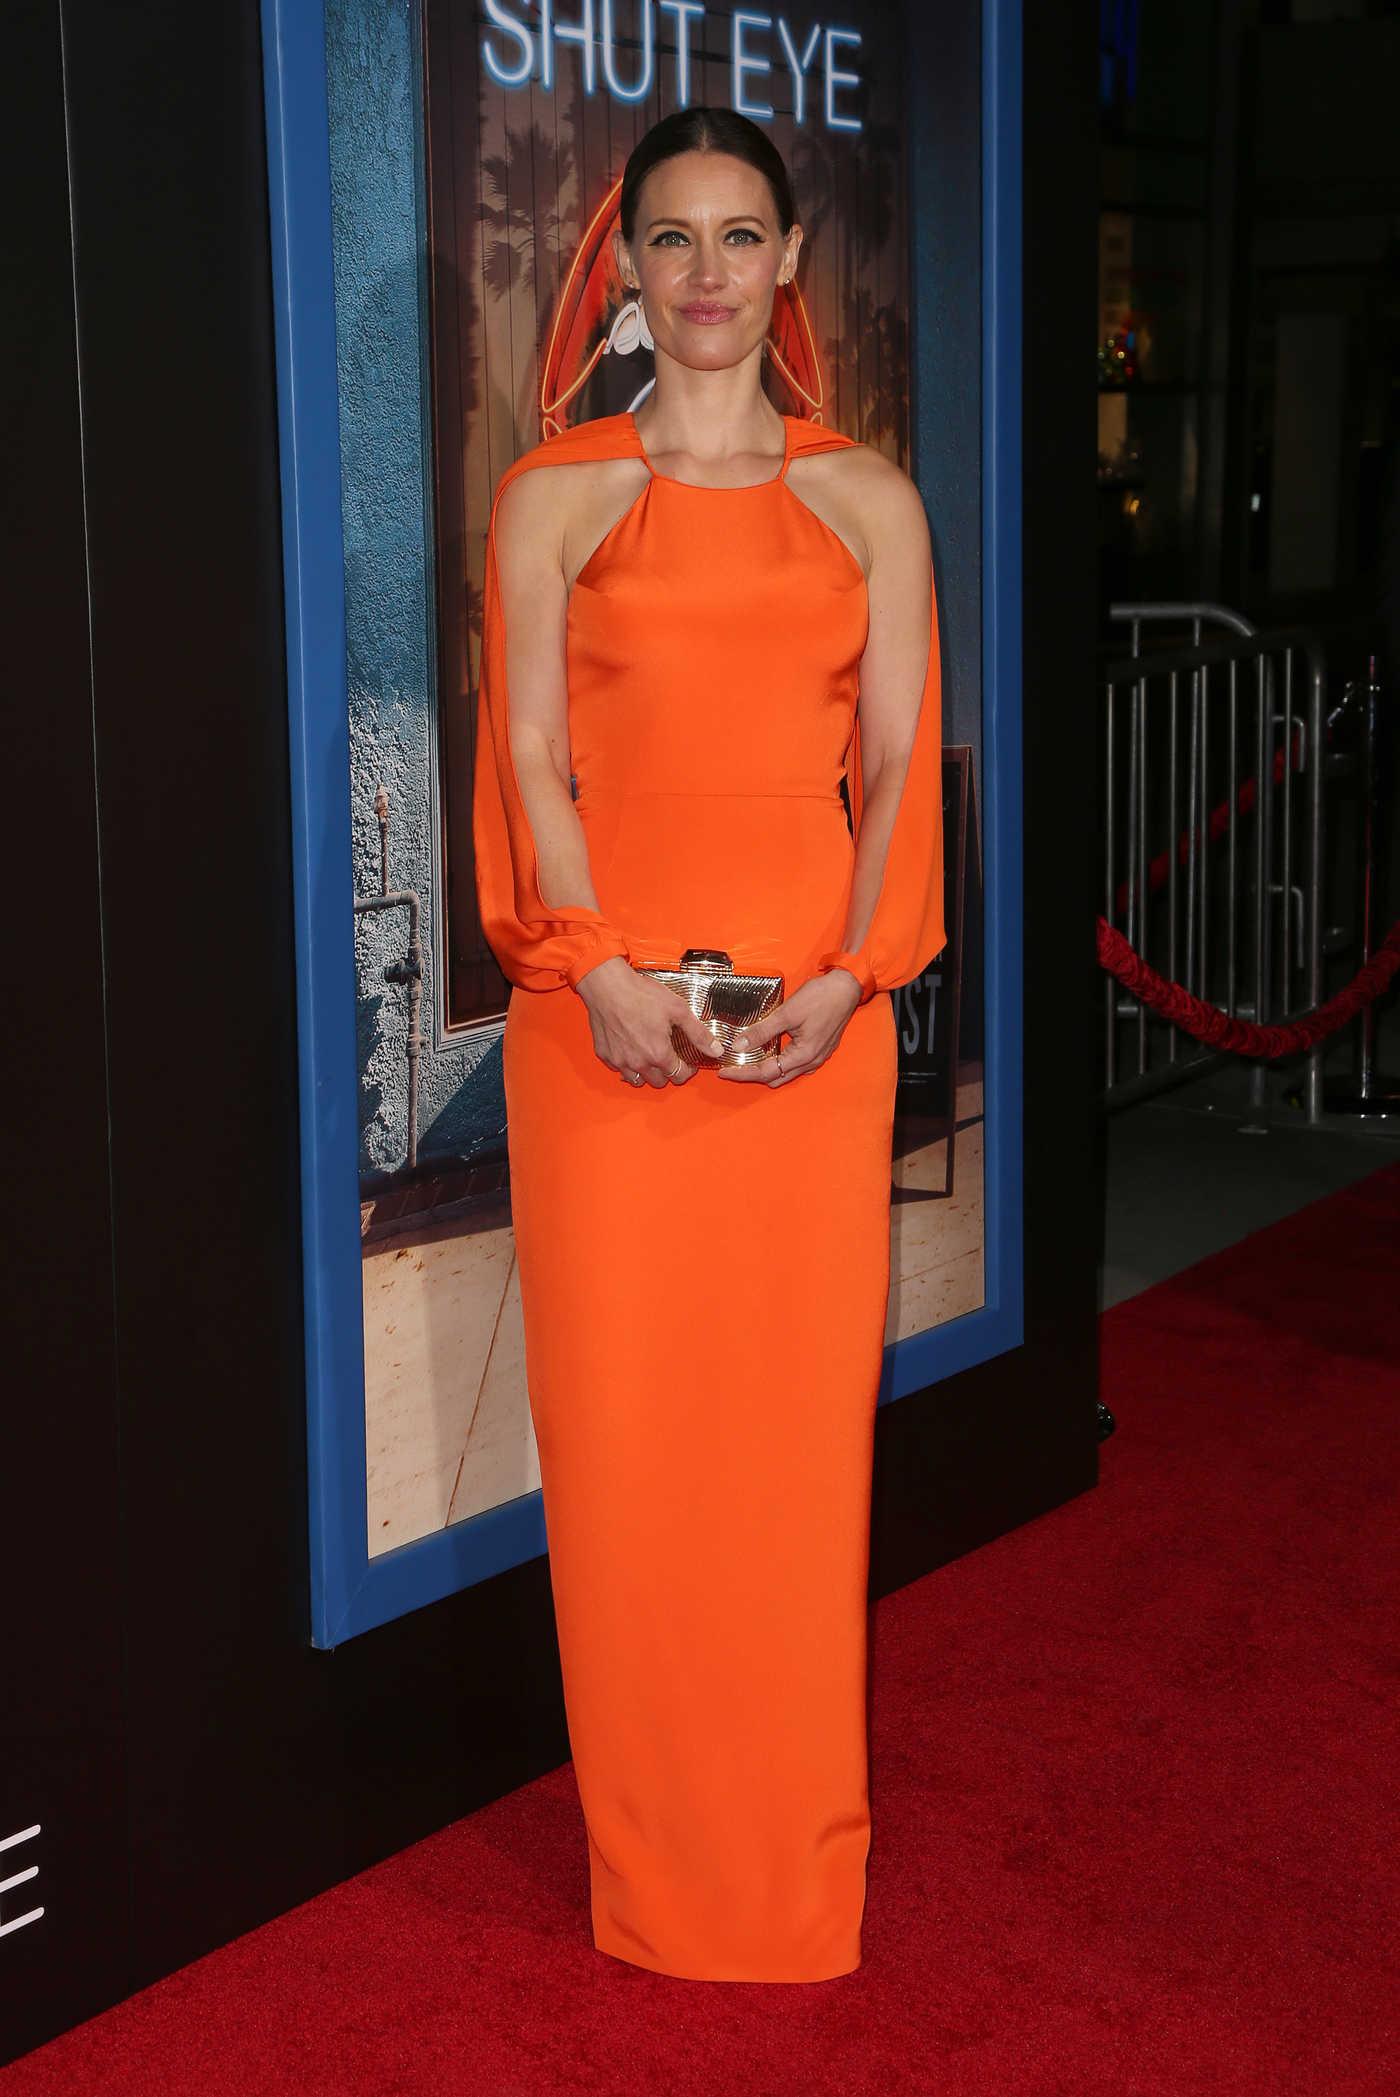 KaDee Strickland at the Shut Eye TV Series Premiere in Los Angeles 12/01/2016